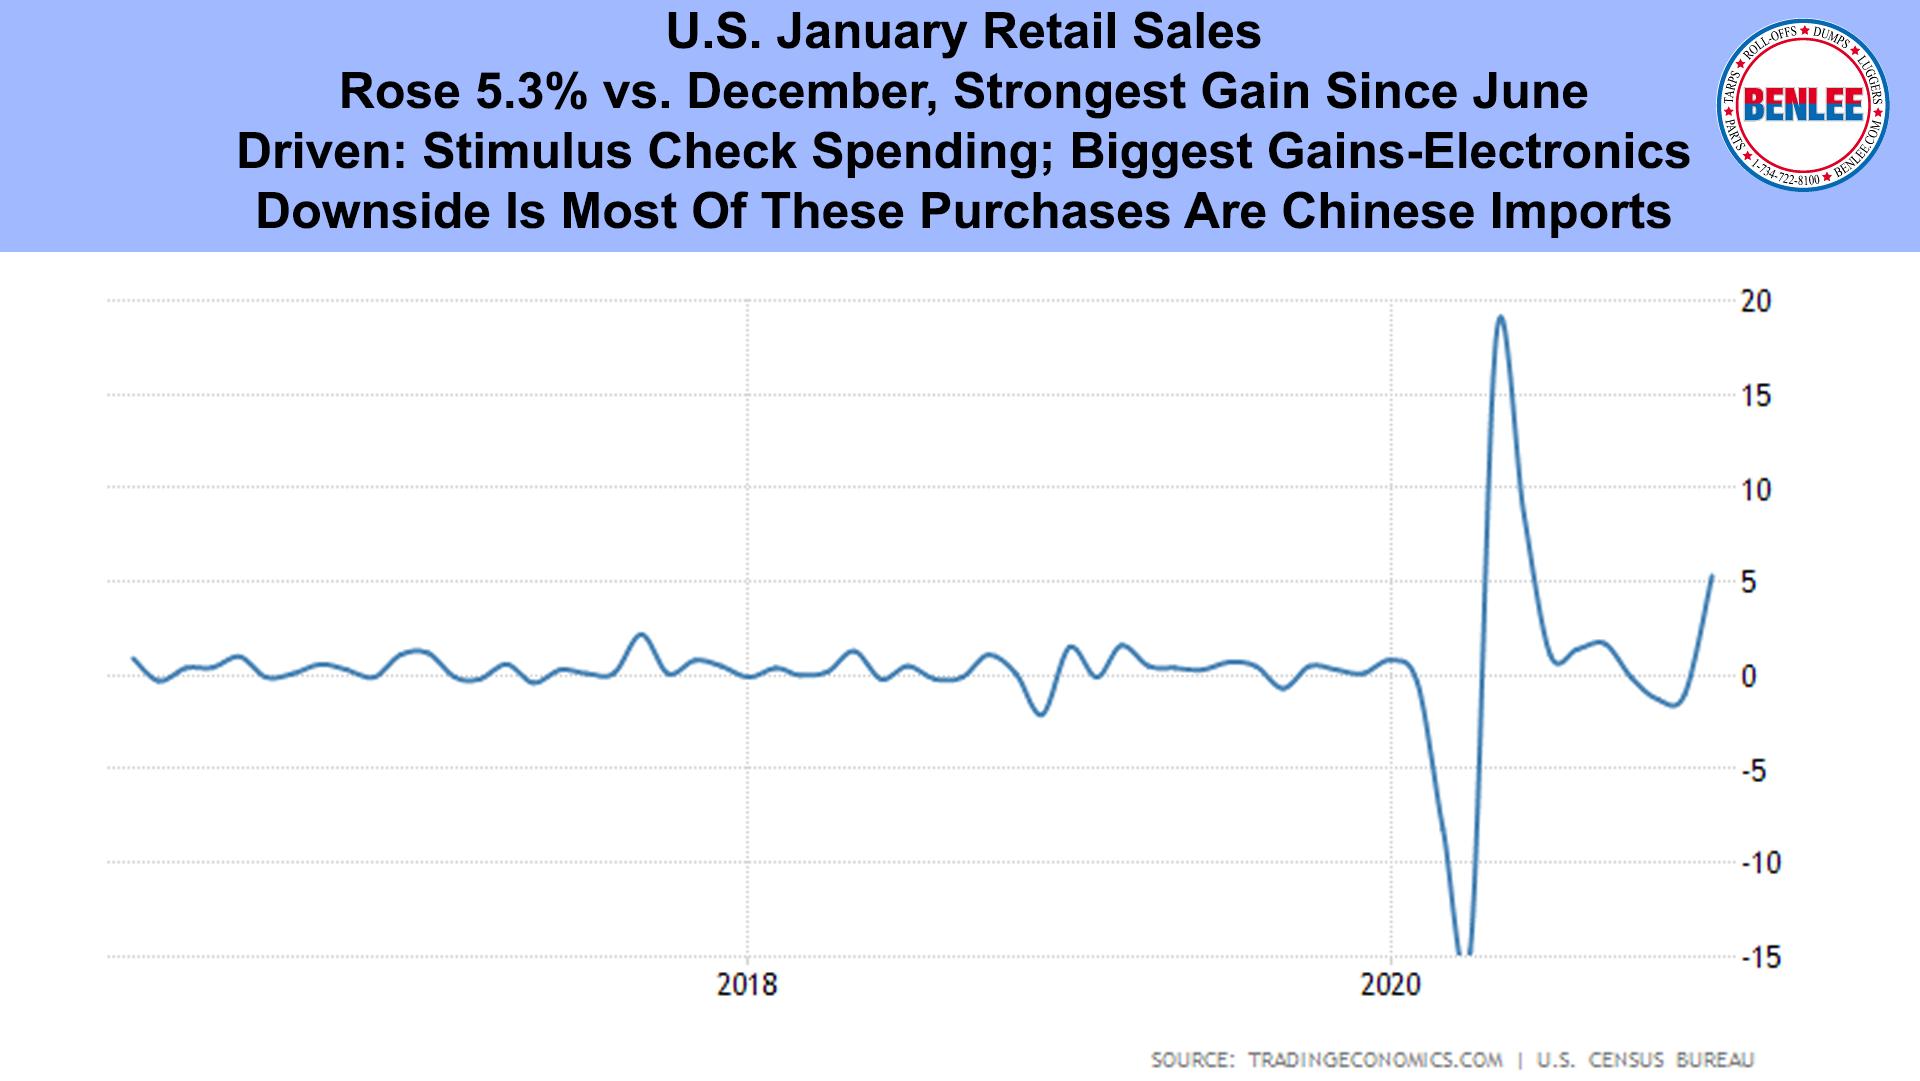 U.S. January Retail Sales